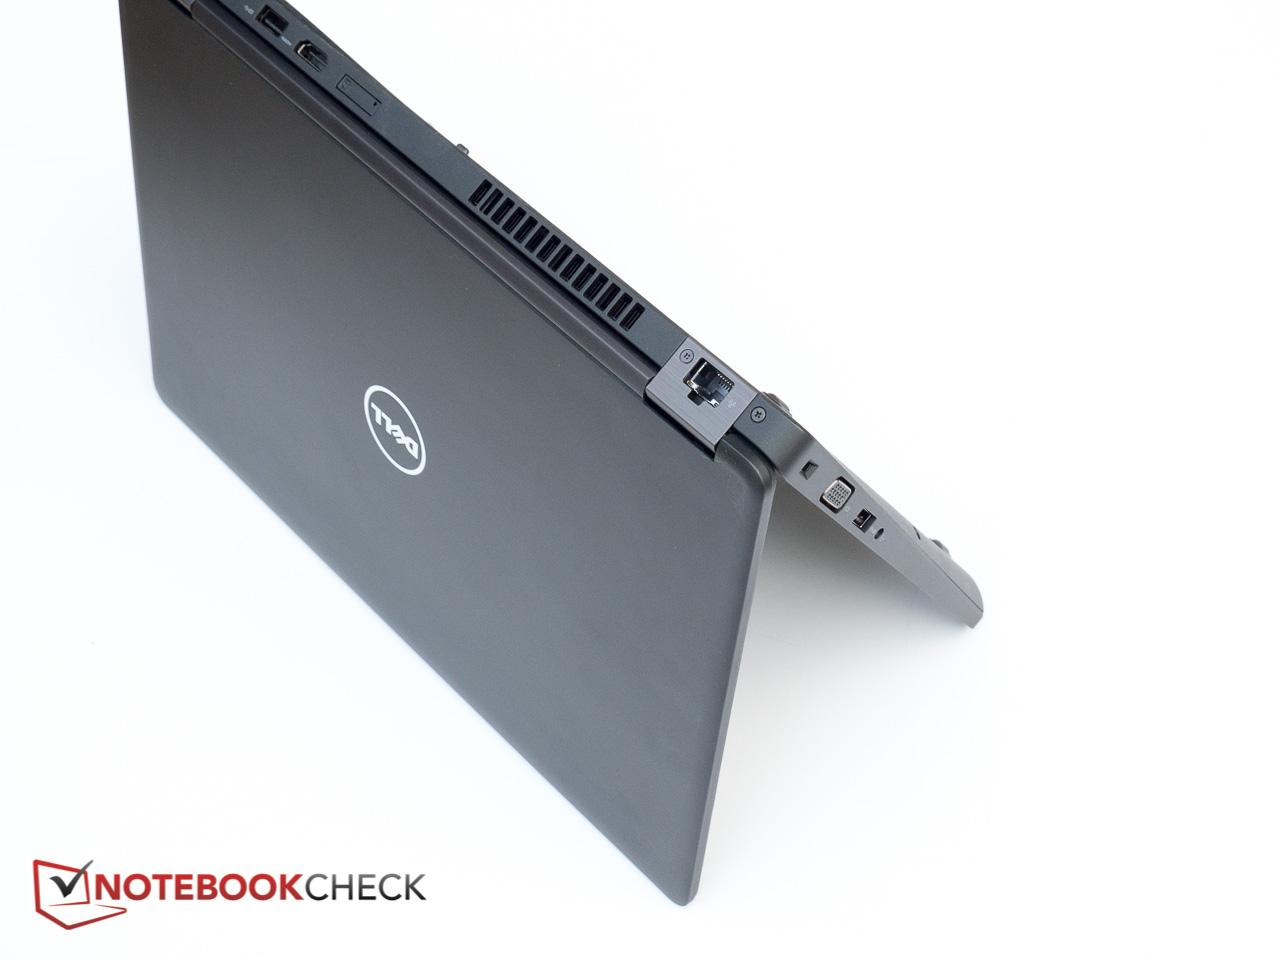 Dell Latitude 5480 (7600U, FHD) Laptop Review